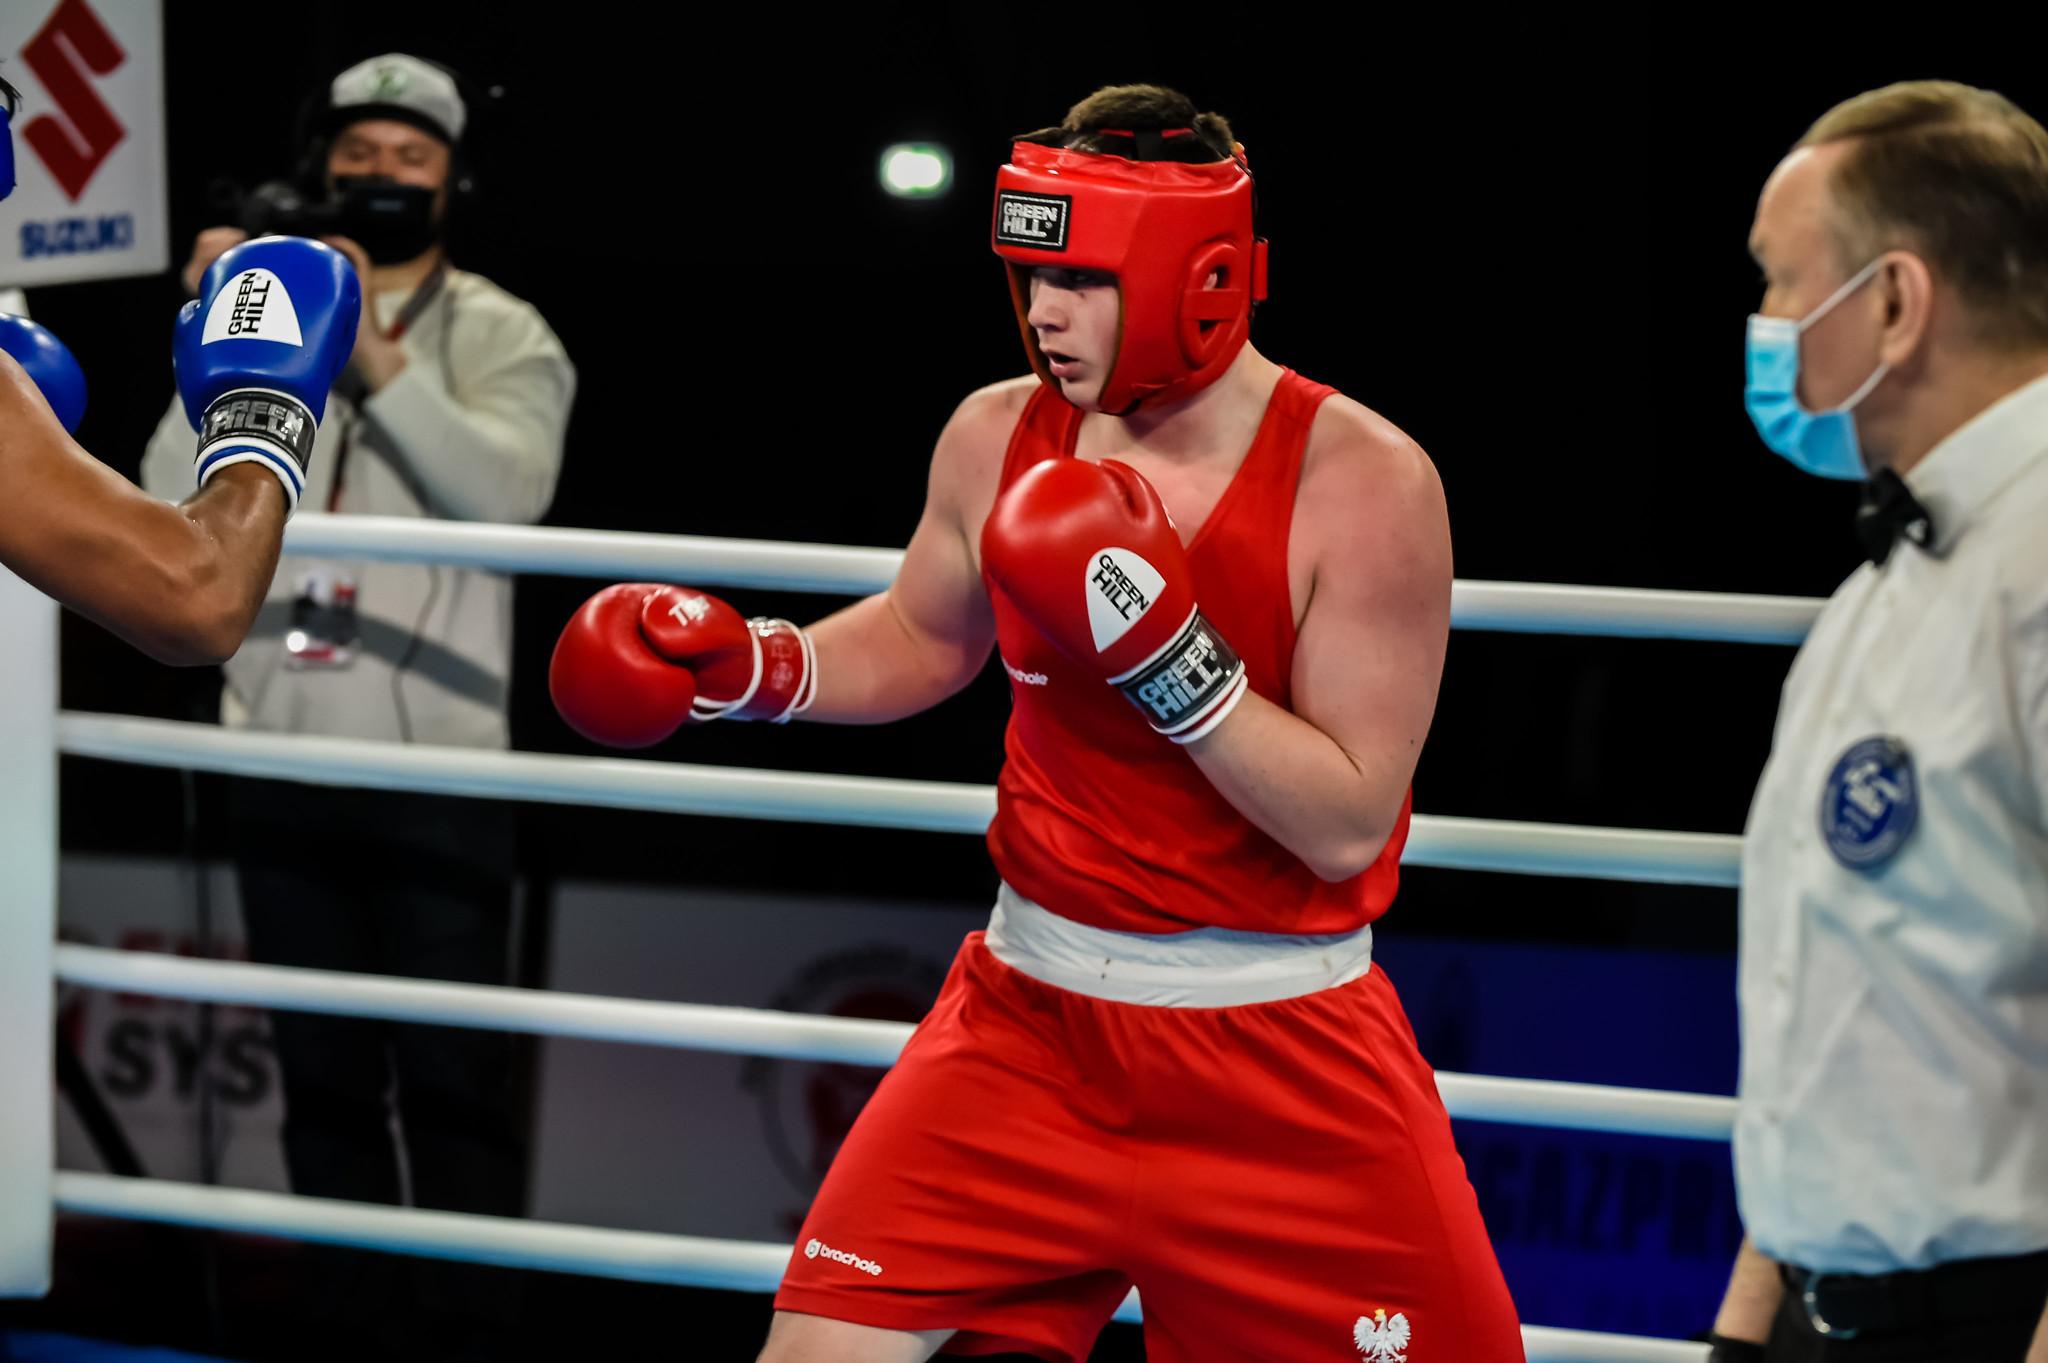 Poland's Jakub Straszewski is into the men's heavyweight final at a home Youth World Championships ©AIBA